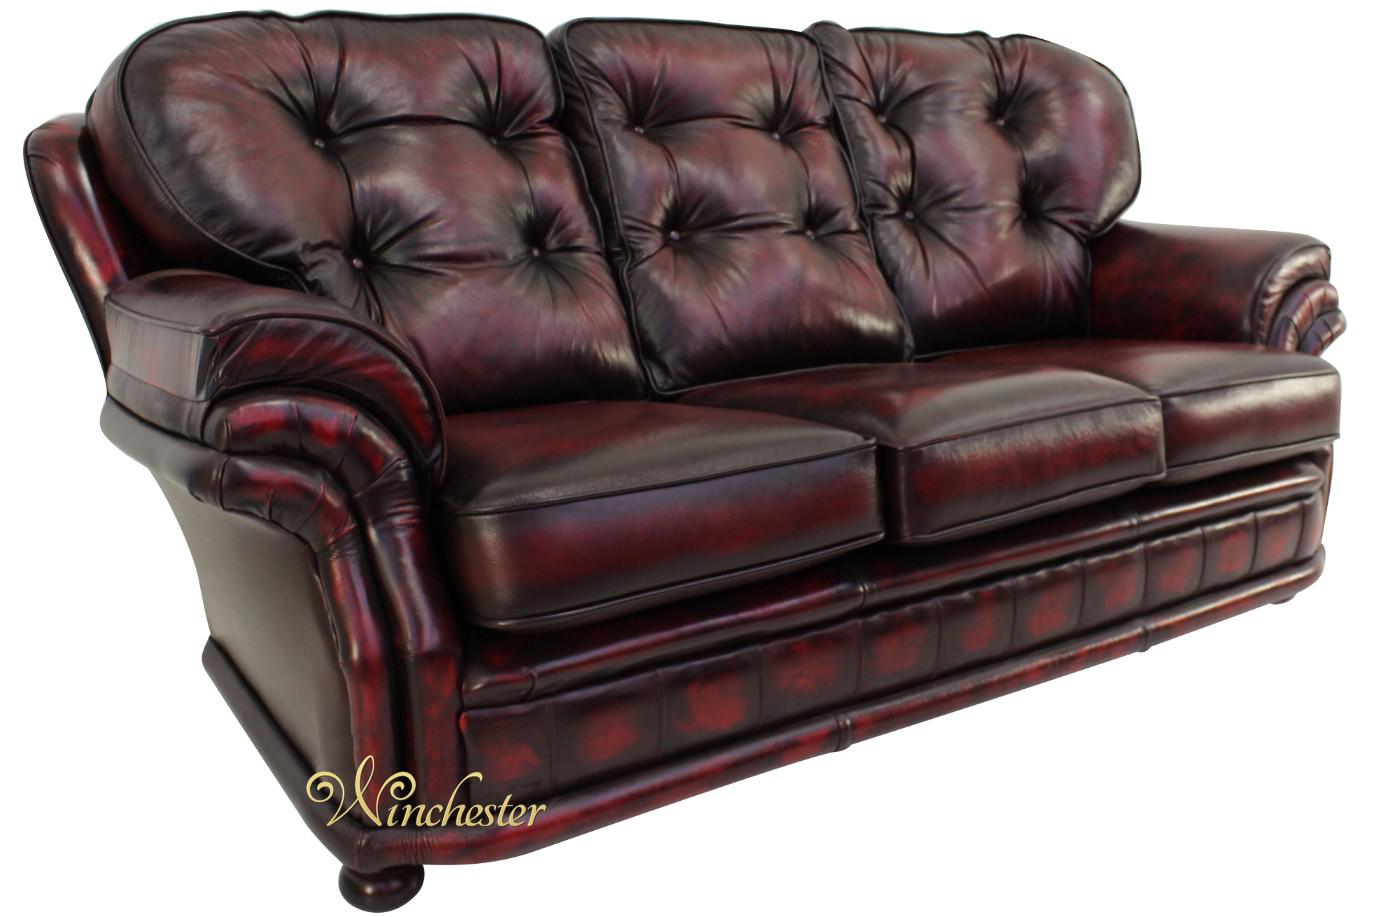 Chesterfield Knightsbridge Leather Sofa